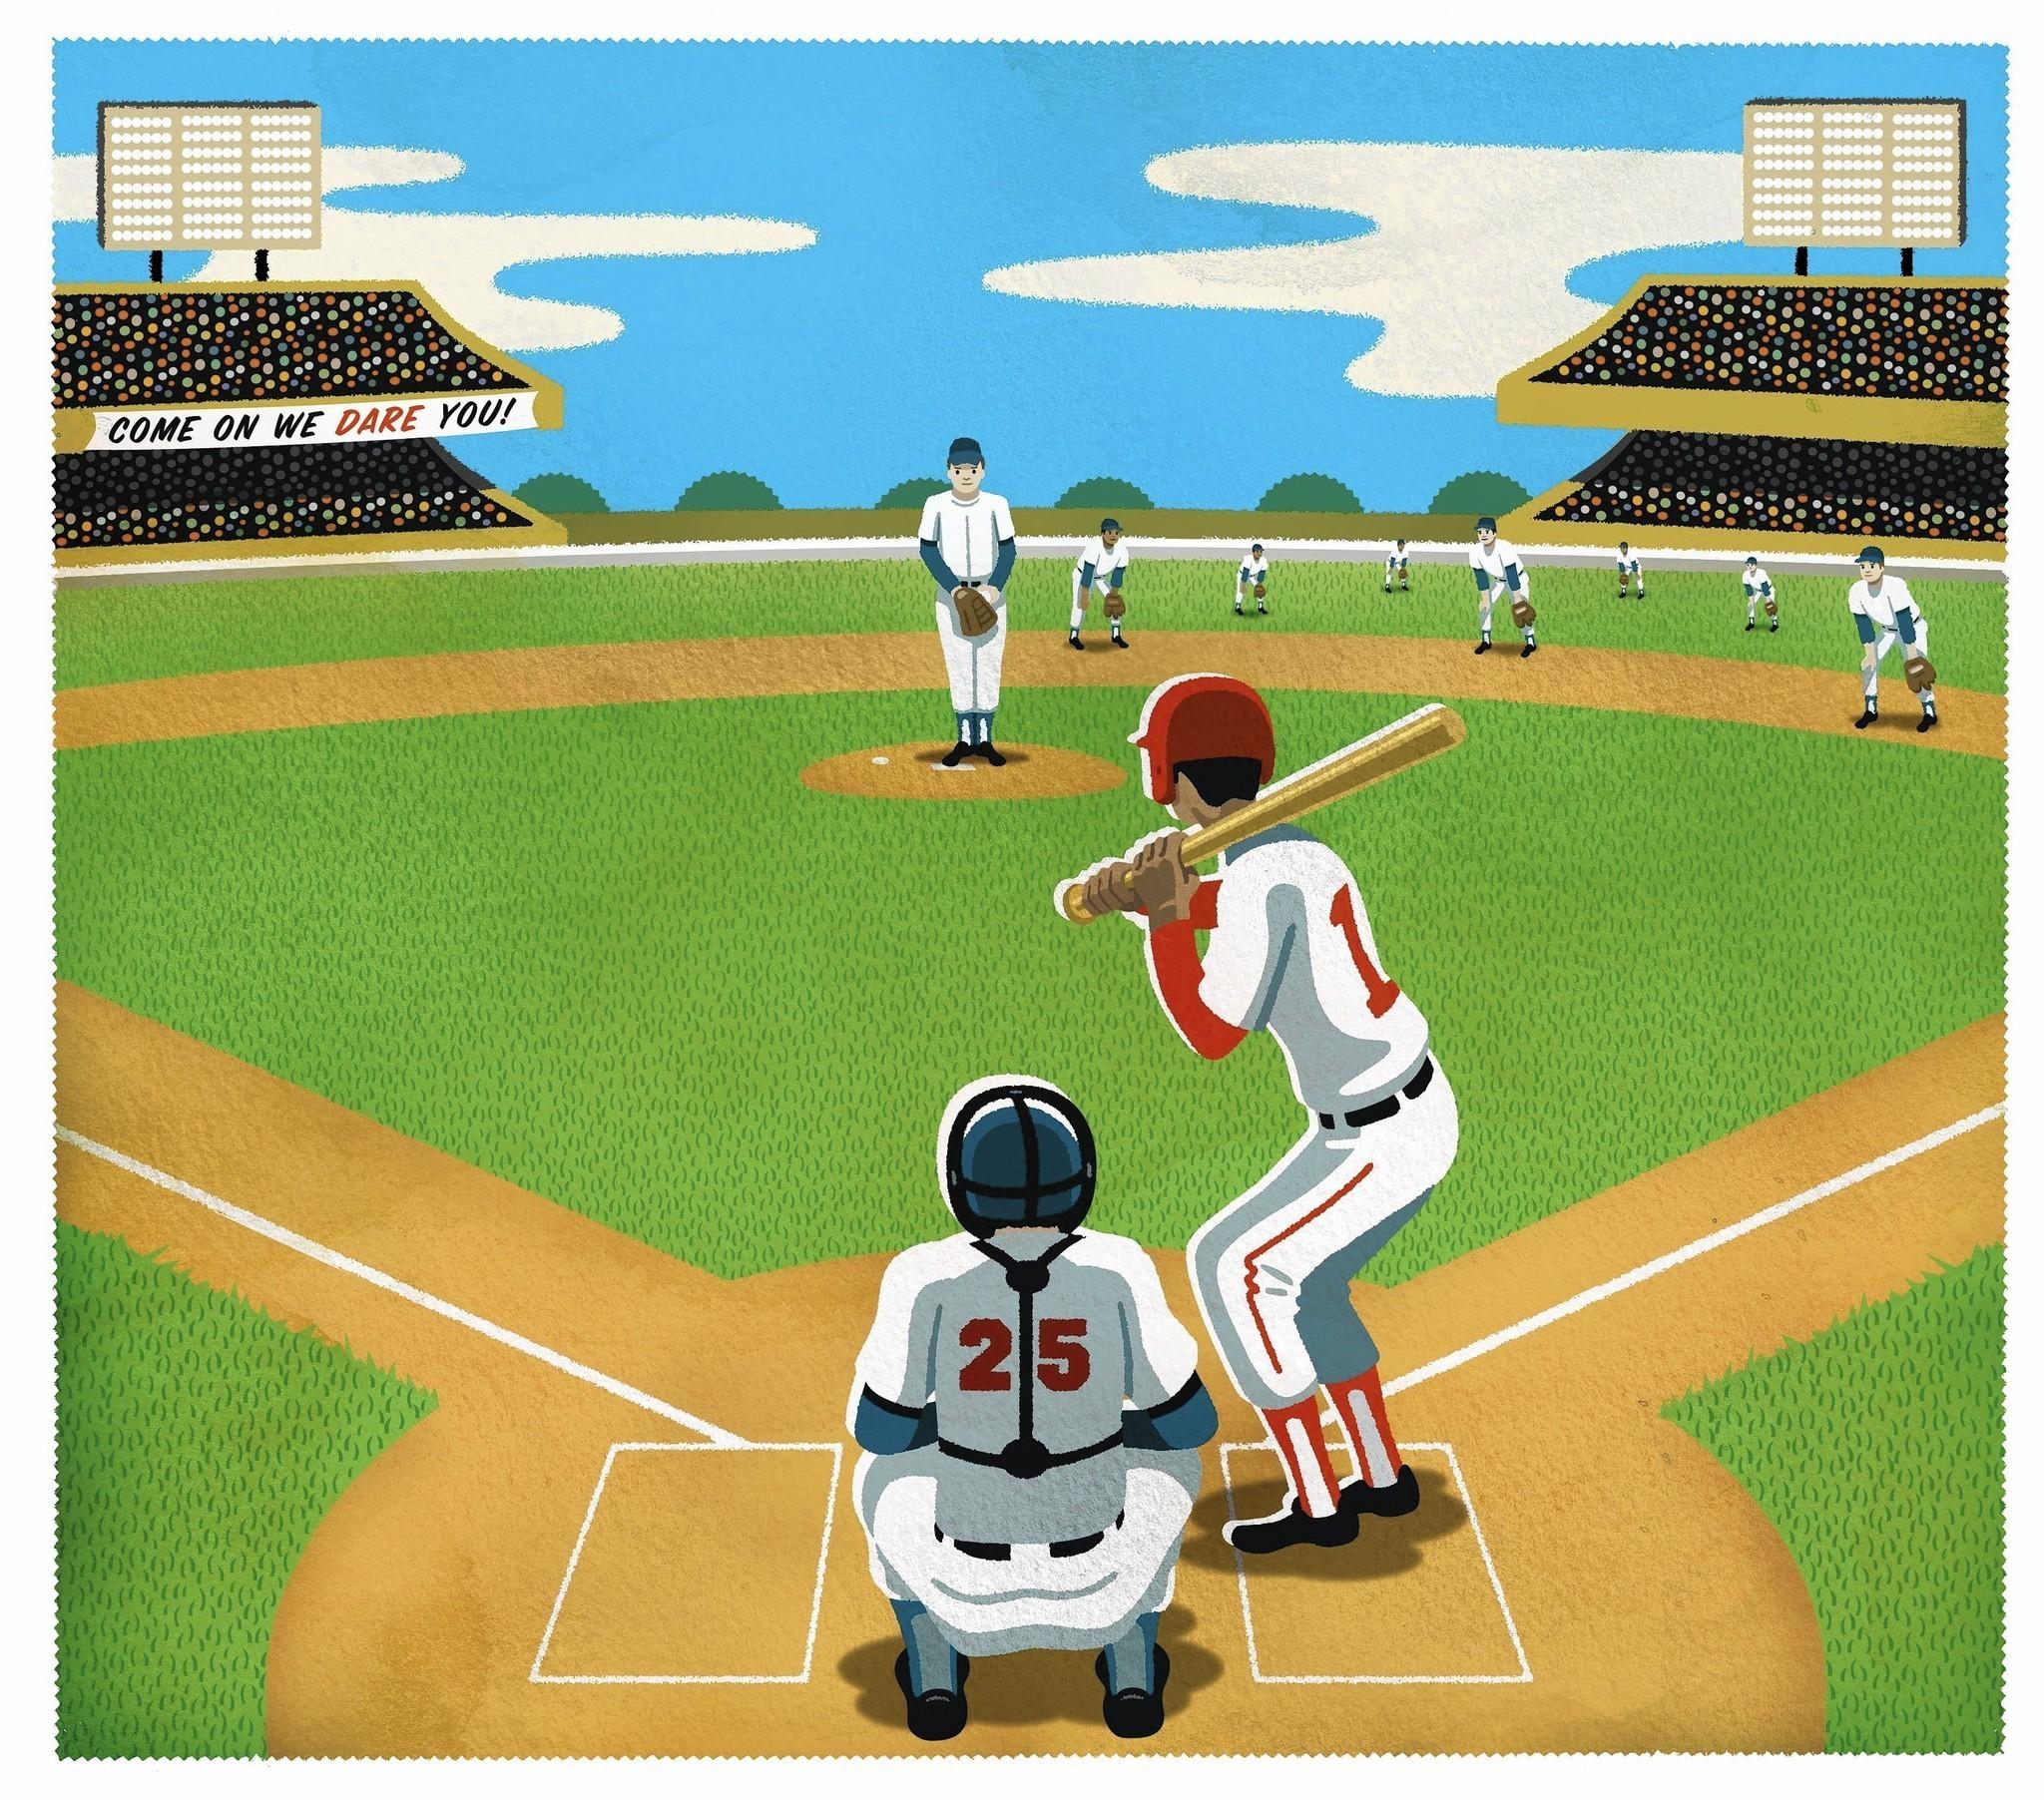 La-sp-am-pm-baseball-shifts-20160426